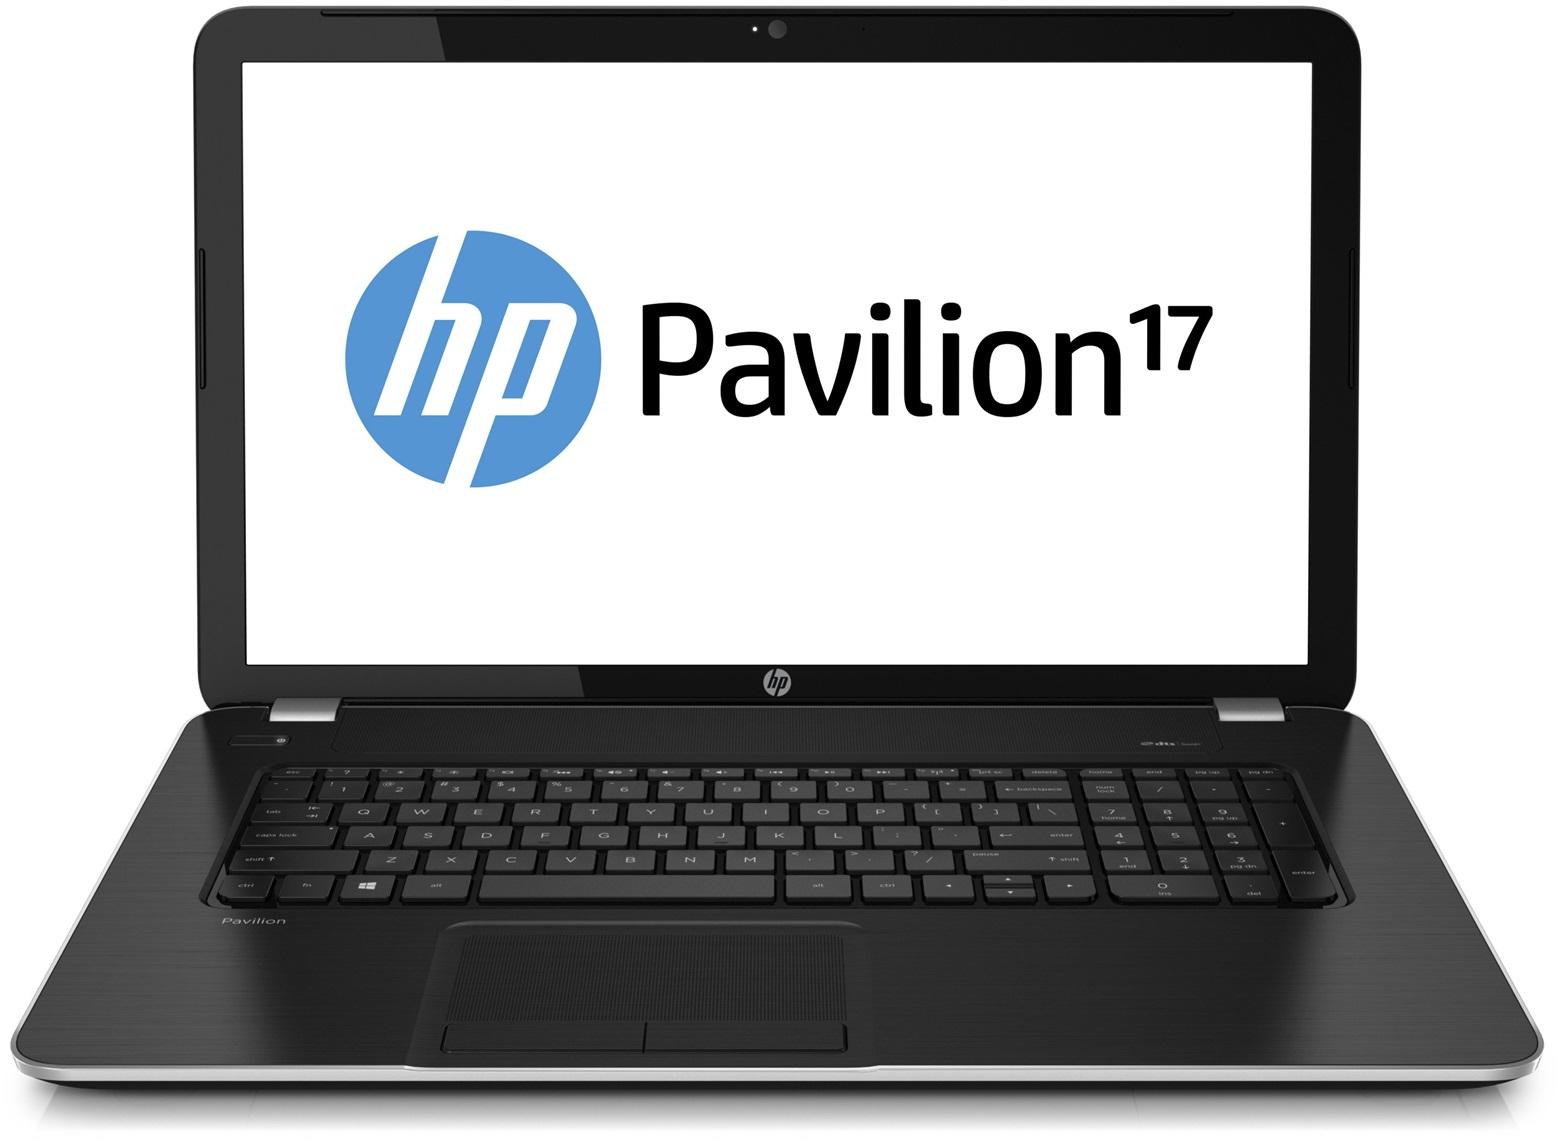 Test Update HP Pavilion 17 E126sg Notebook